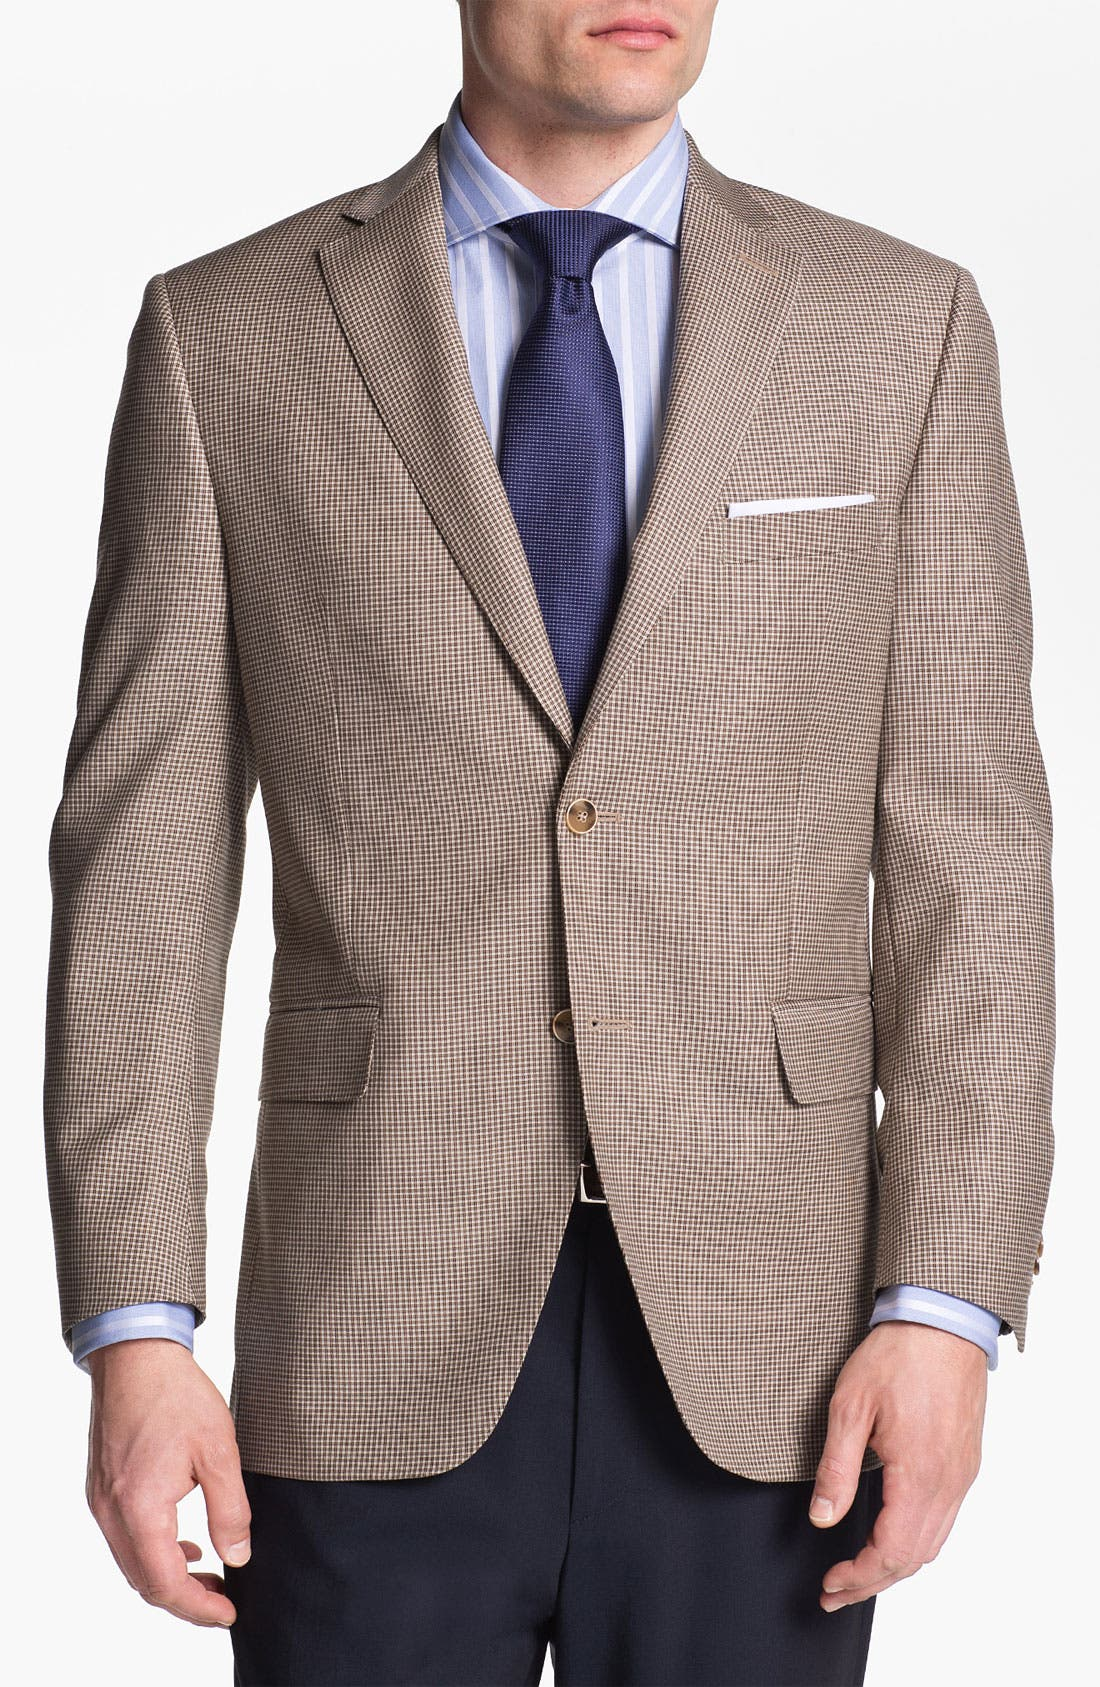 Main Image - Peter Millar Check Sportcoat